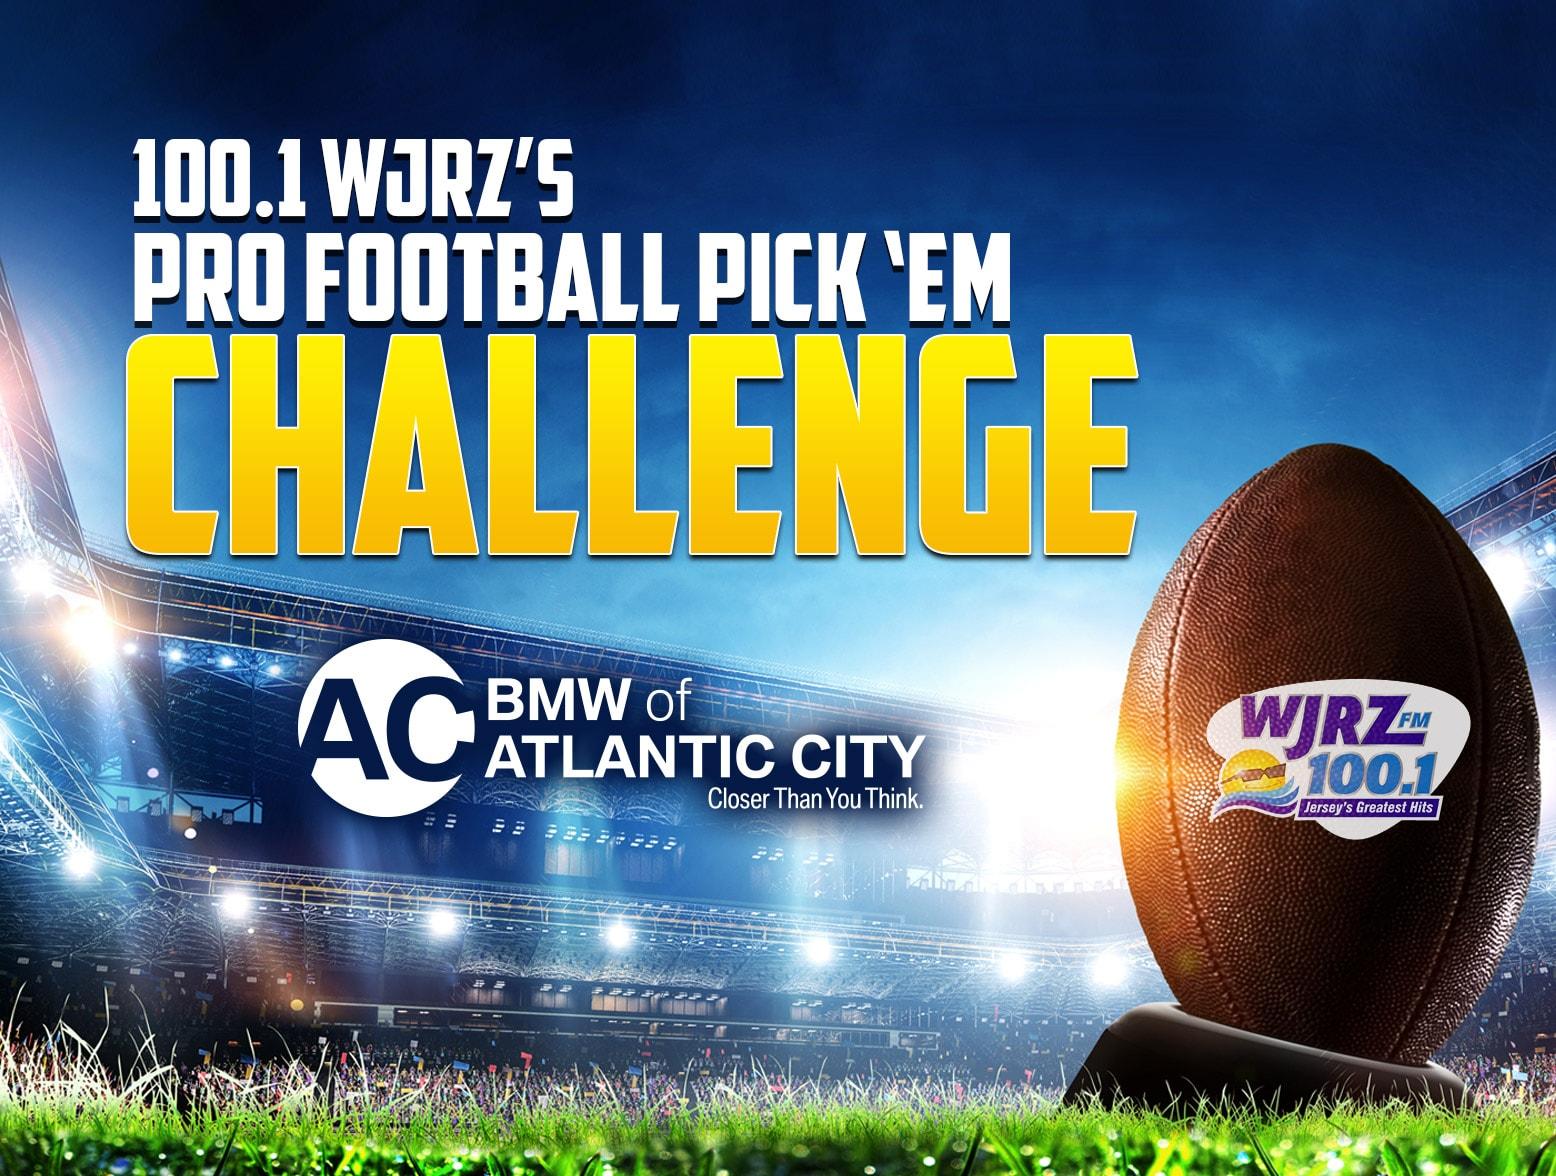 WJRZ's Pro Football Pick 'Em Challenge